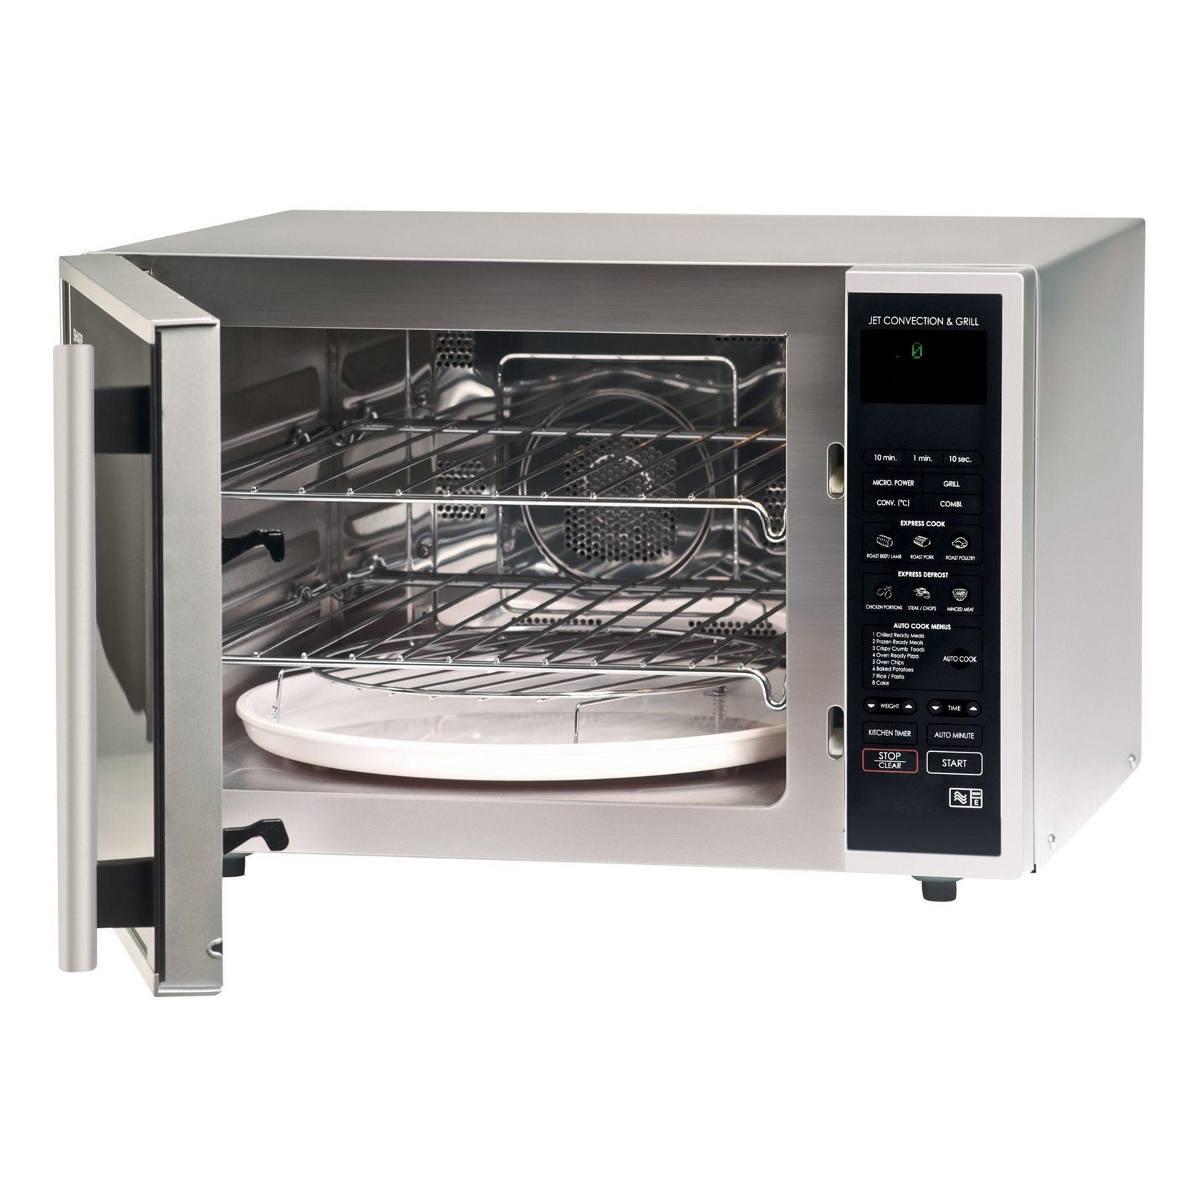 Sharp R959slmaa 40l 900w Combination Microwave Hughes Trade